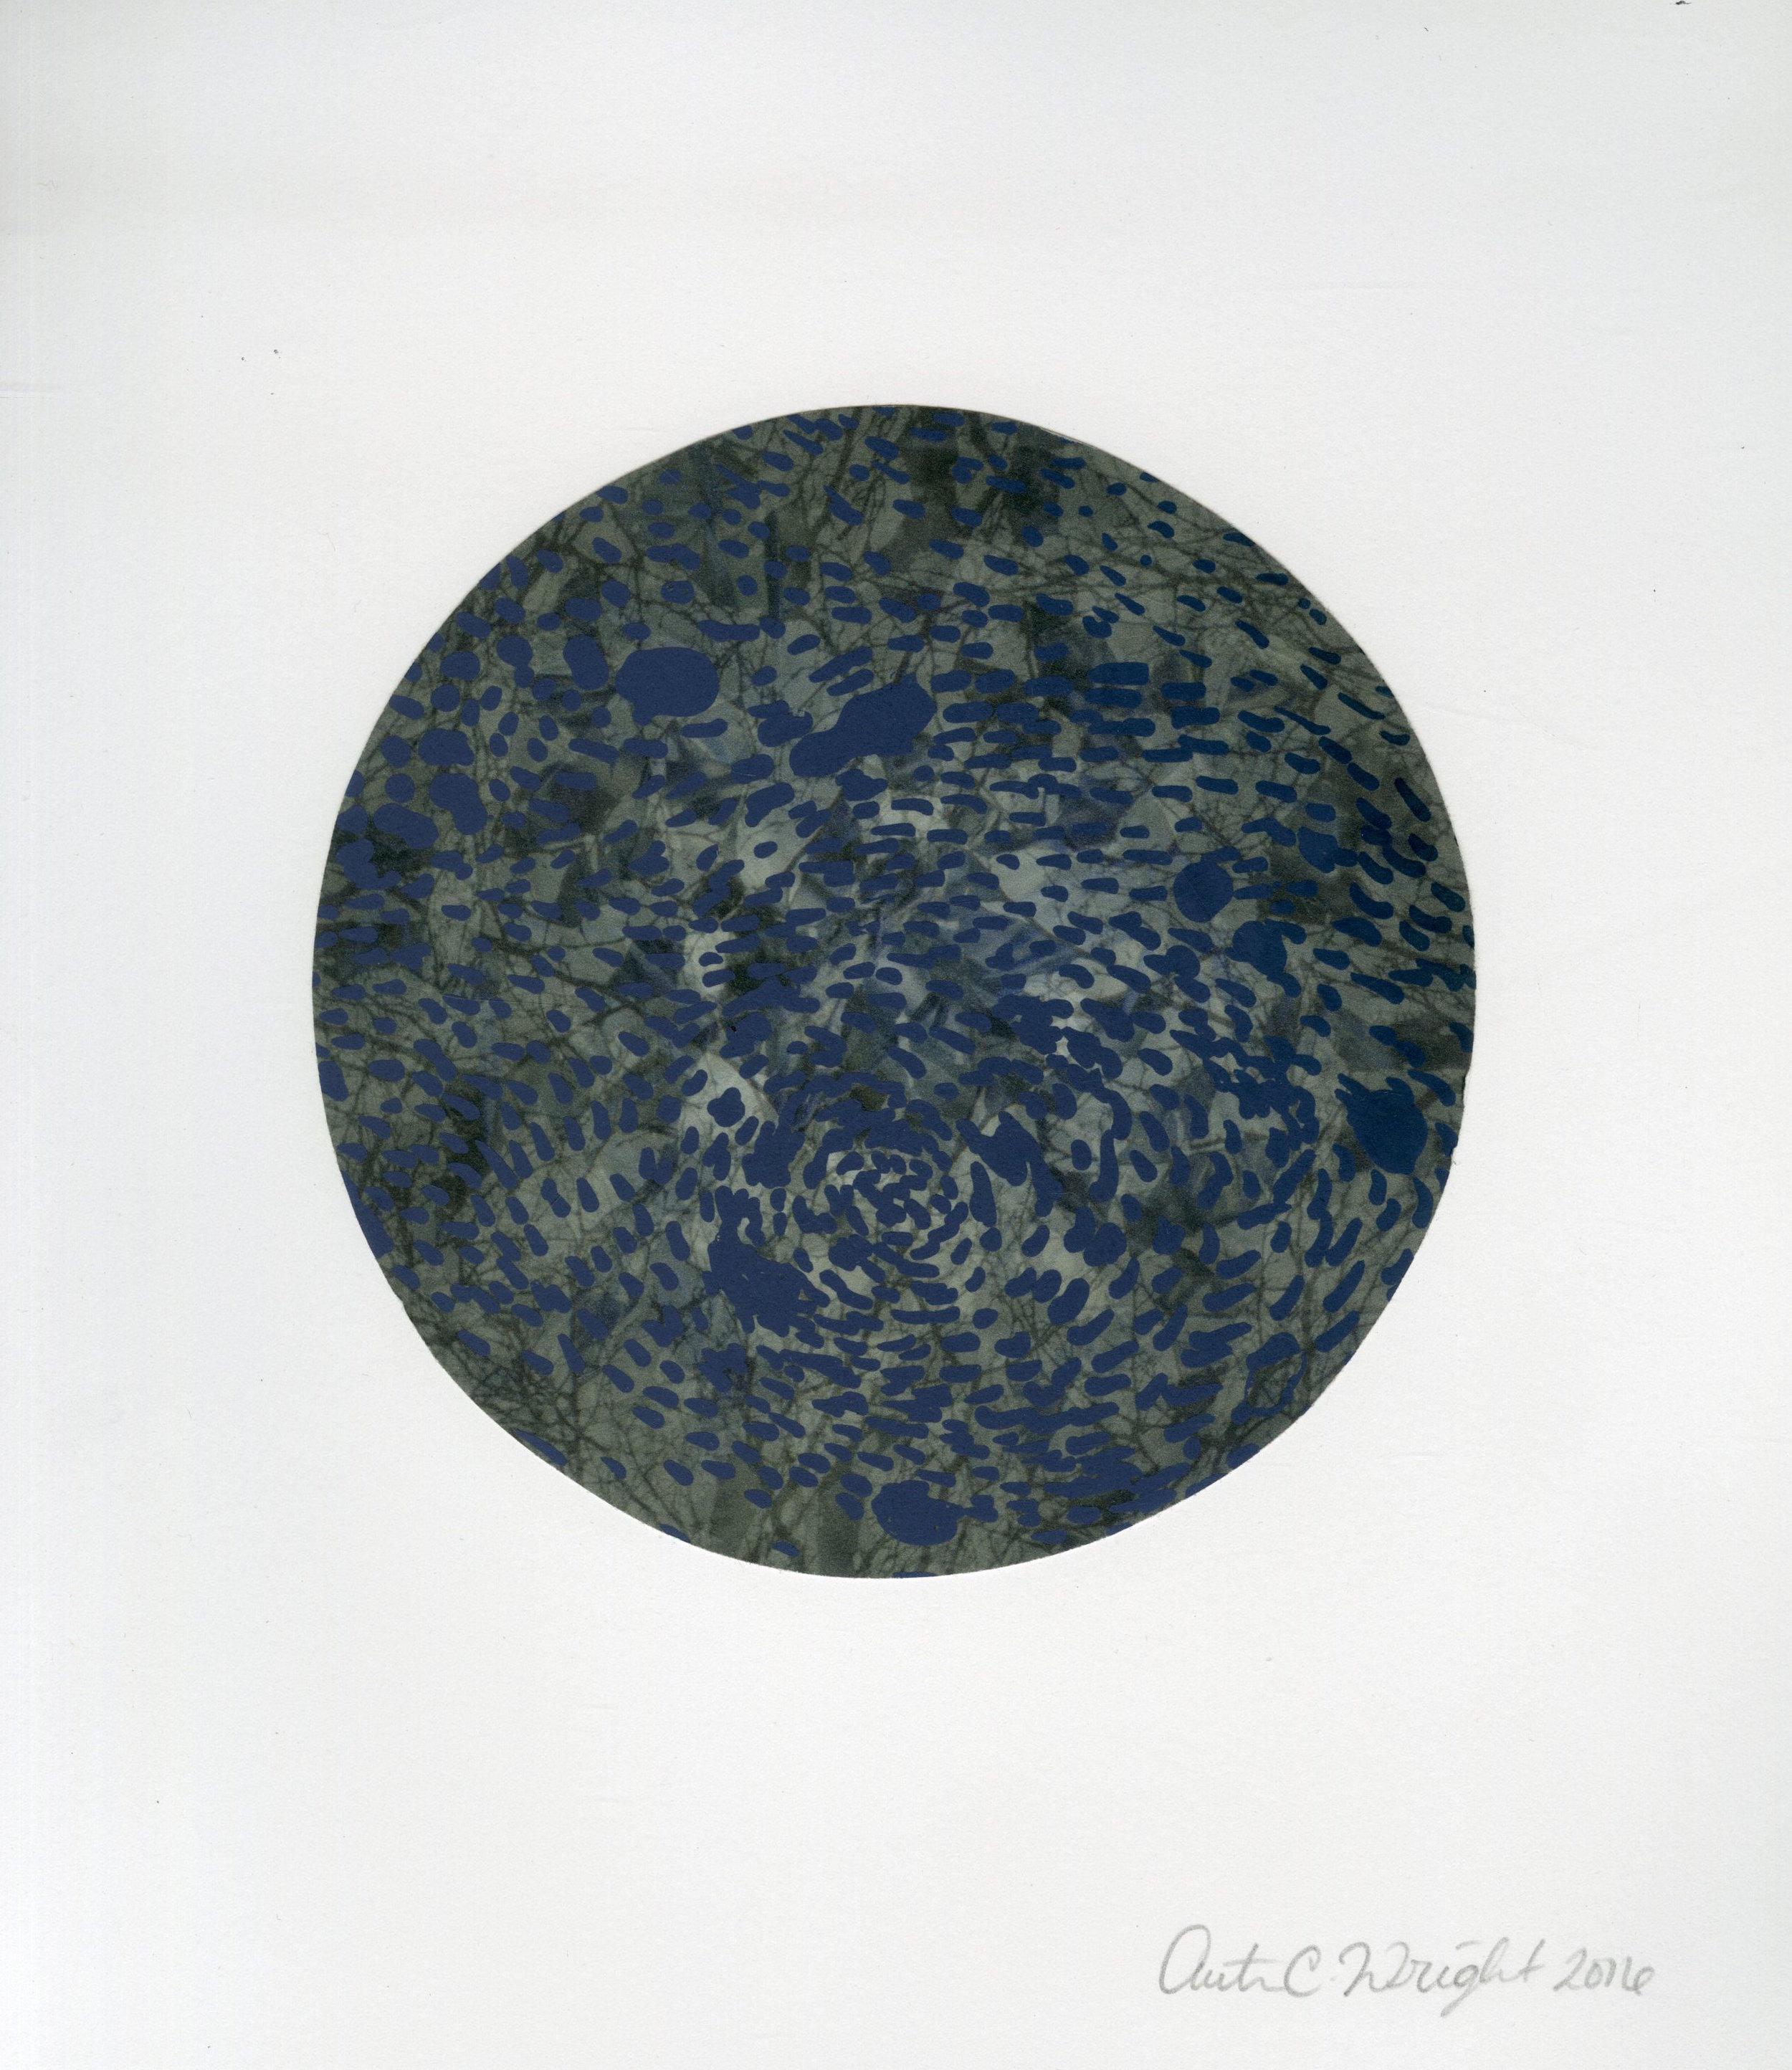 circle076.jpg